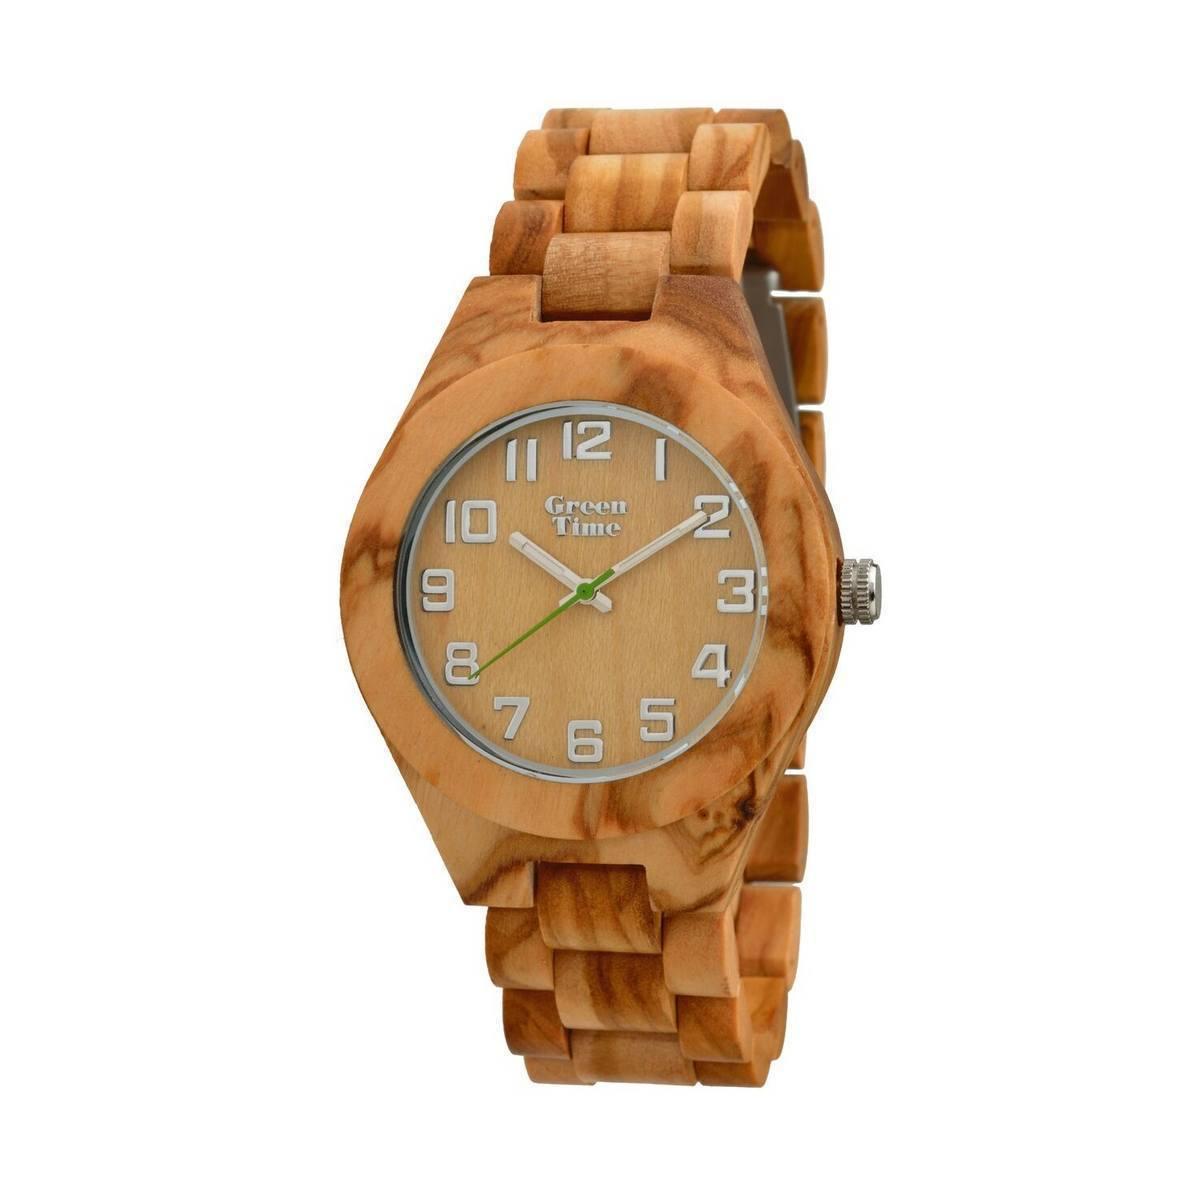 "GreenTime - Houten Unisex horloge ZW058A ""City Basic"" Florence , 3HD Quartz uurwerk (Olijf Hout, Bruin, Zilver accenten)"